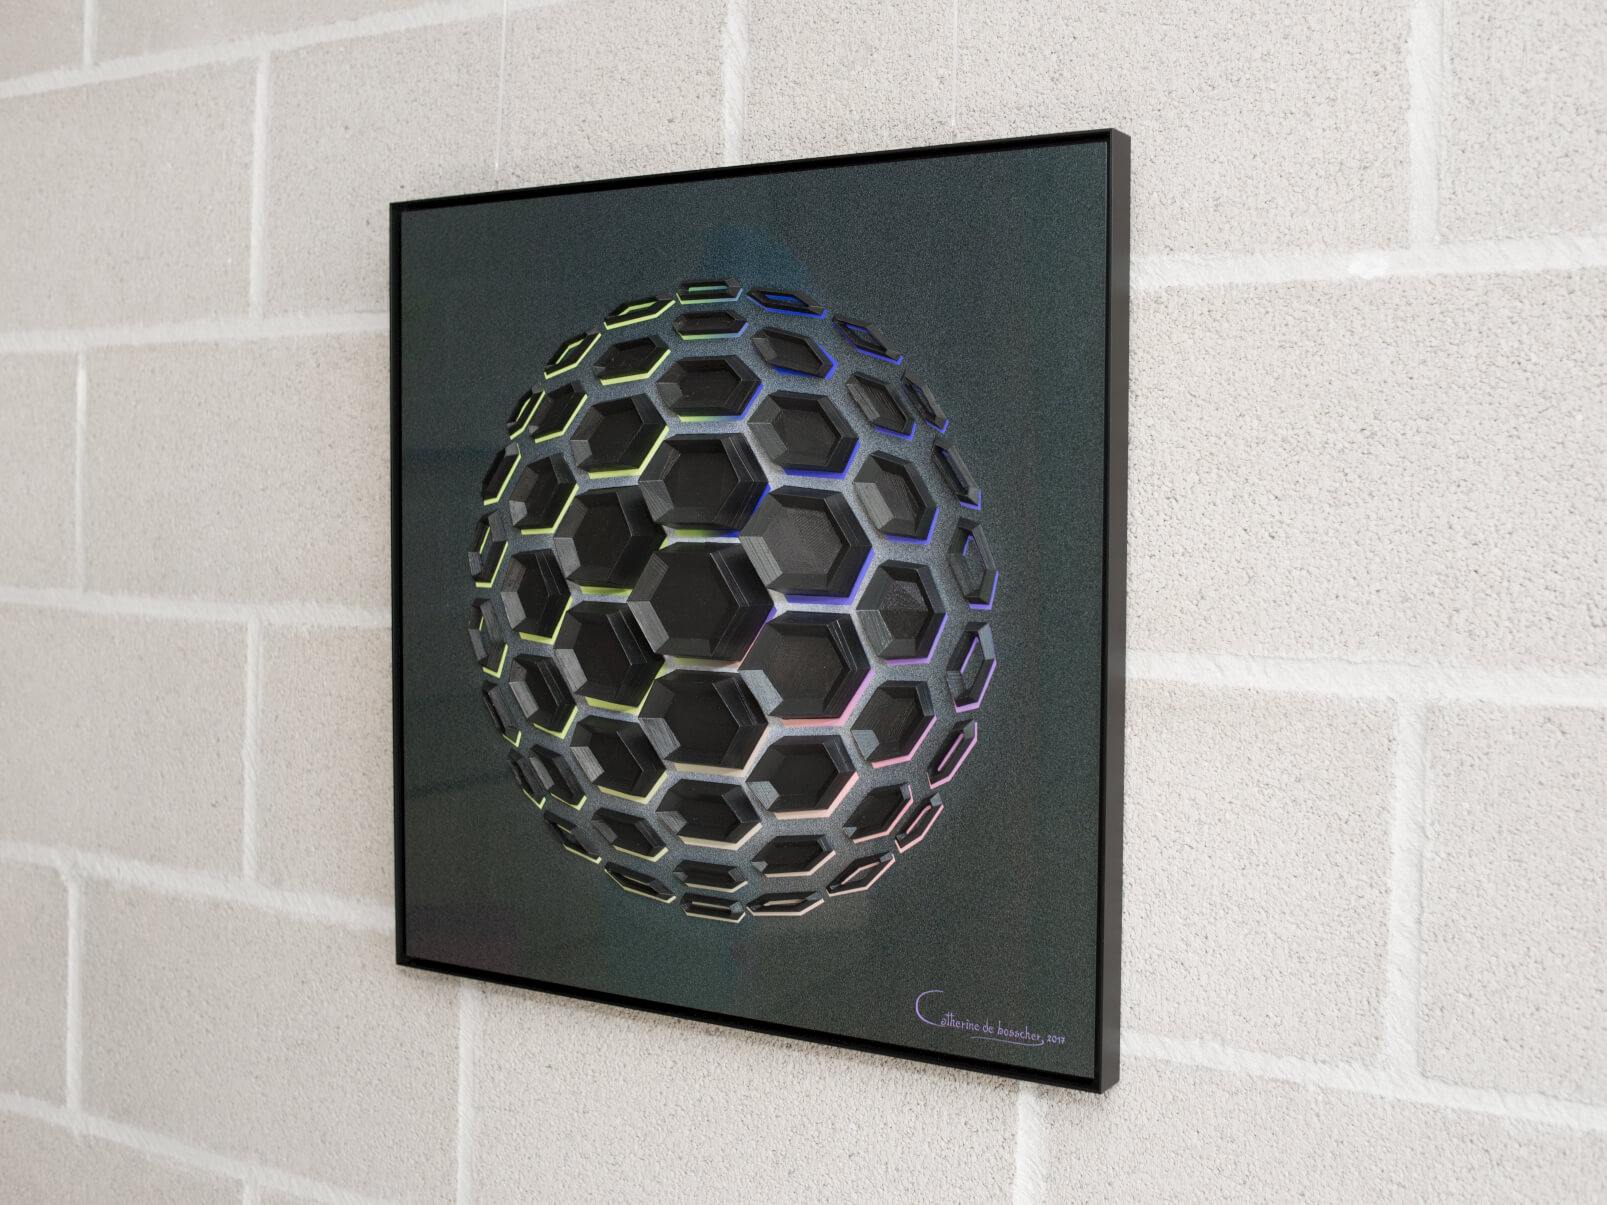 """Black Matter 51"" - 49x49x5.5cm/ 19.3x19.3x2.2 inch"